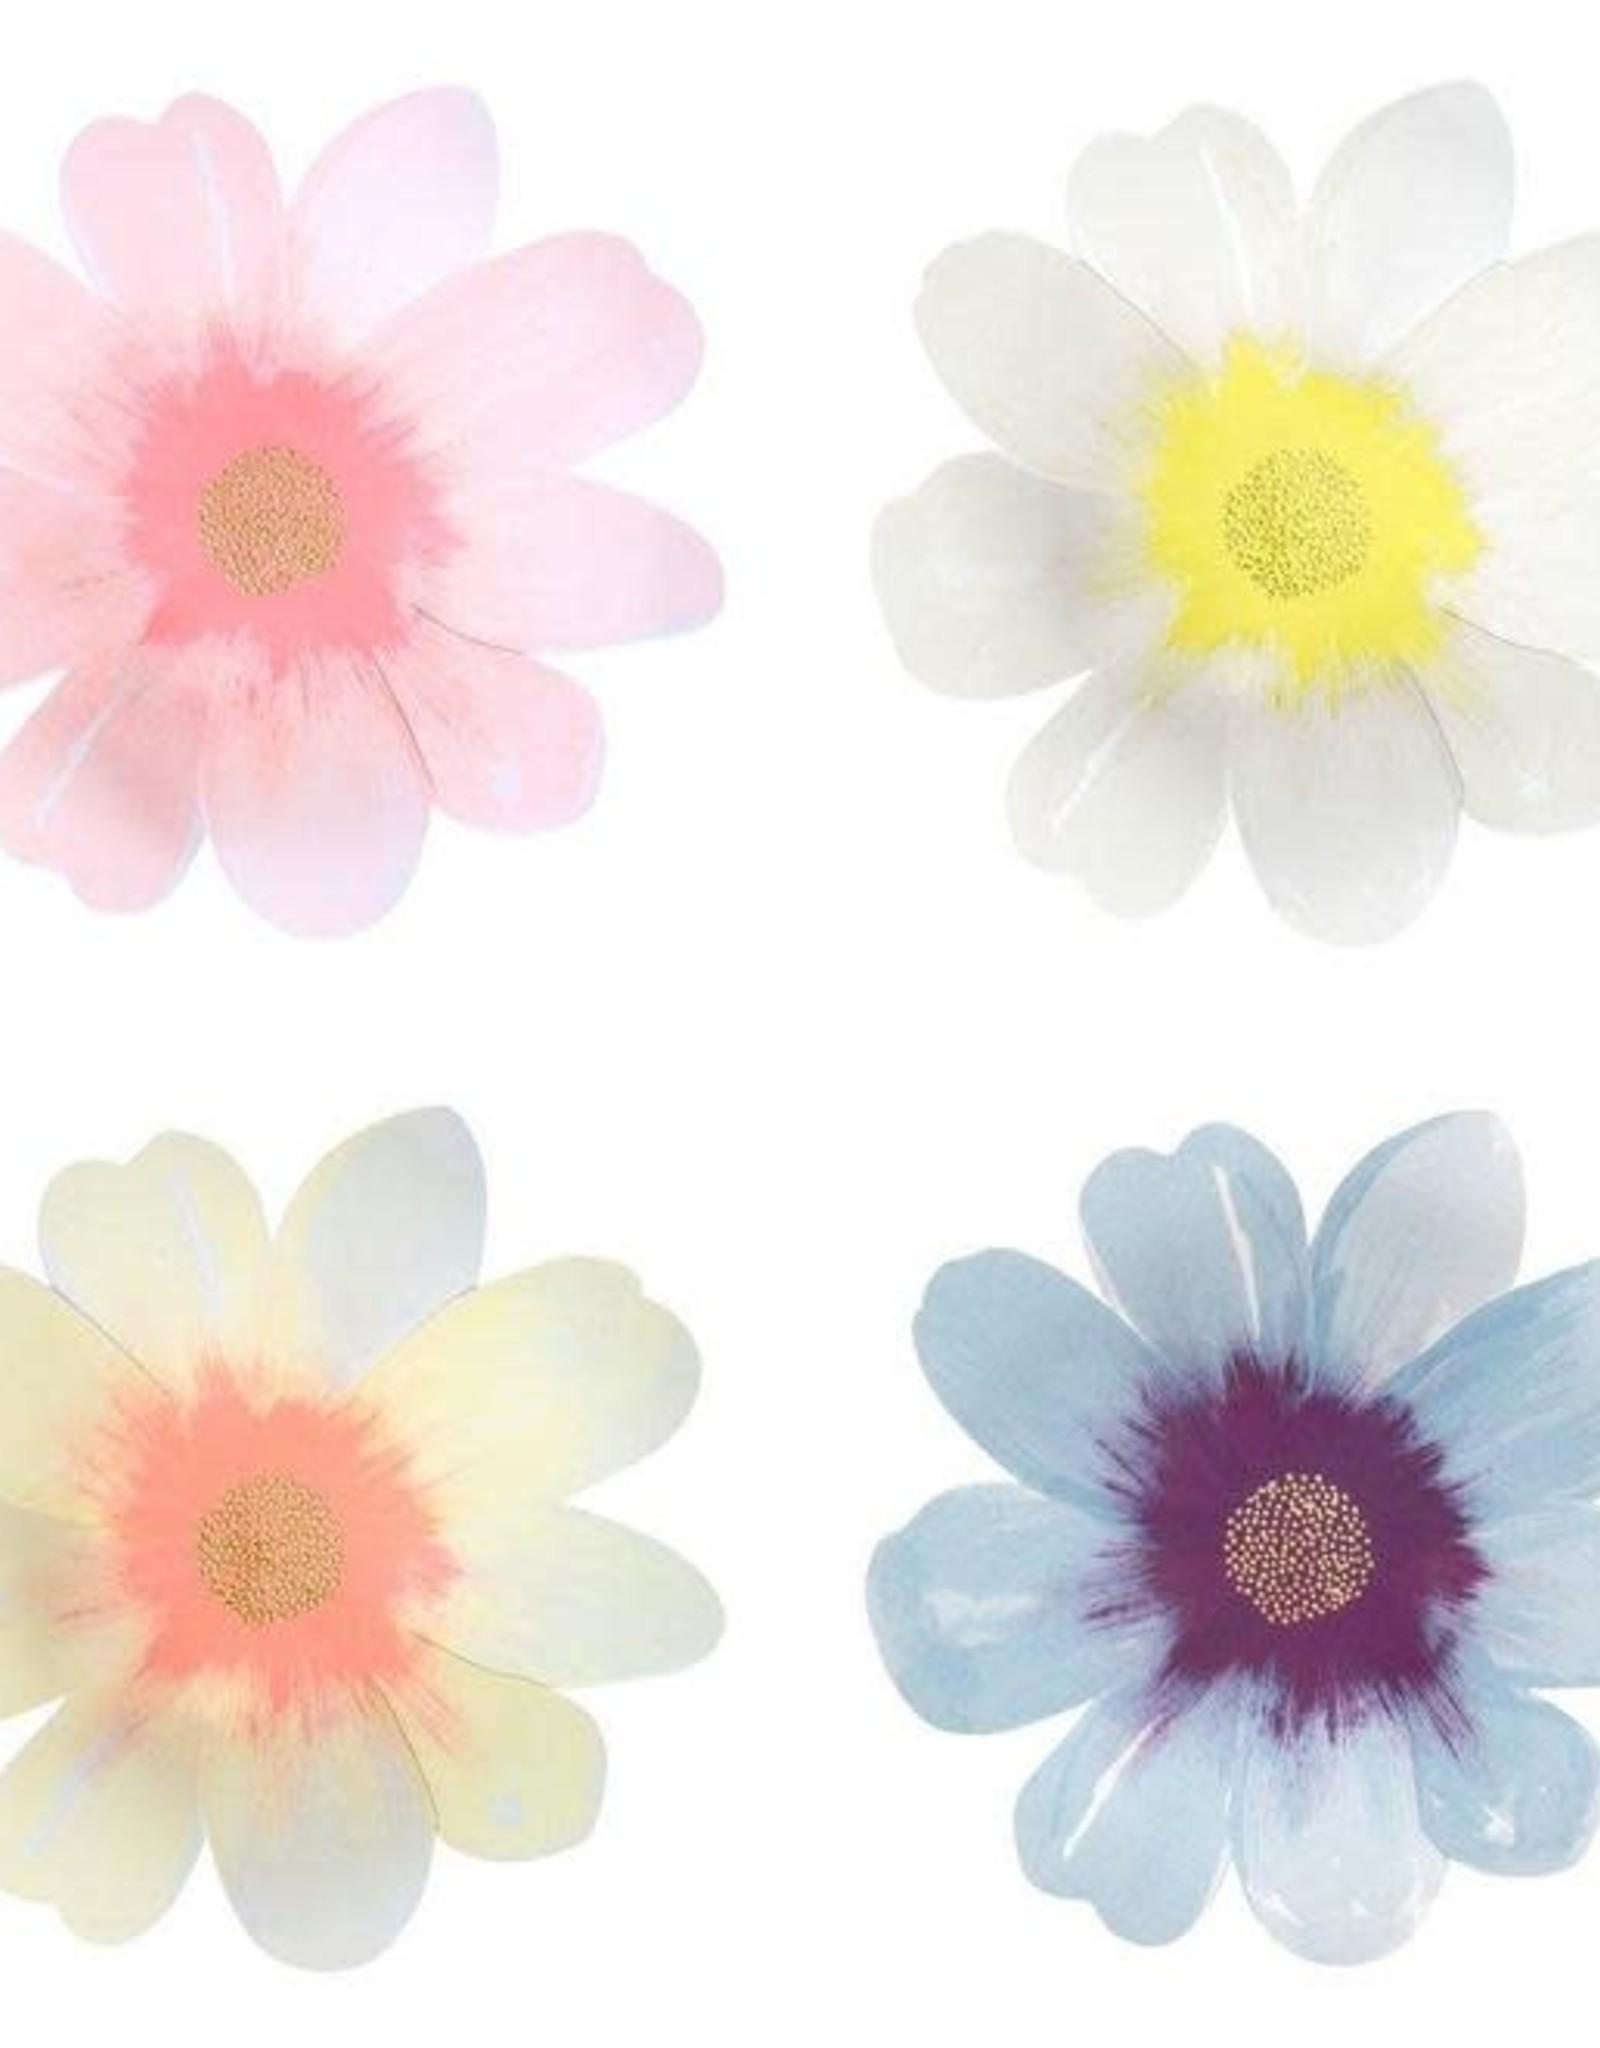 Meri Meri Meri Meri   Flower Garden Large Plates (set of 8)